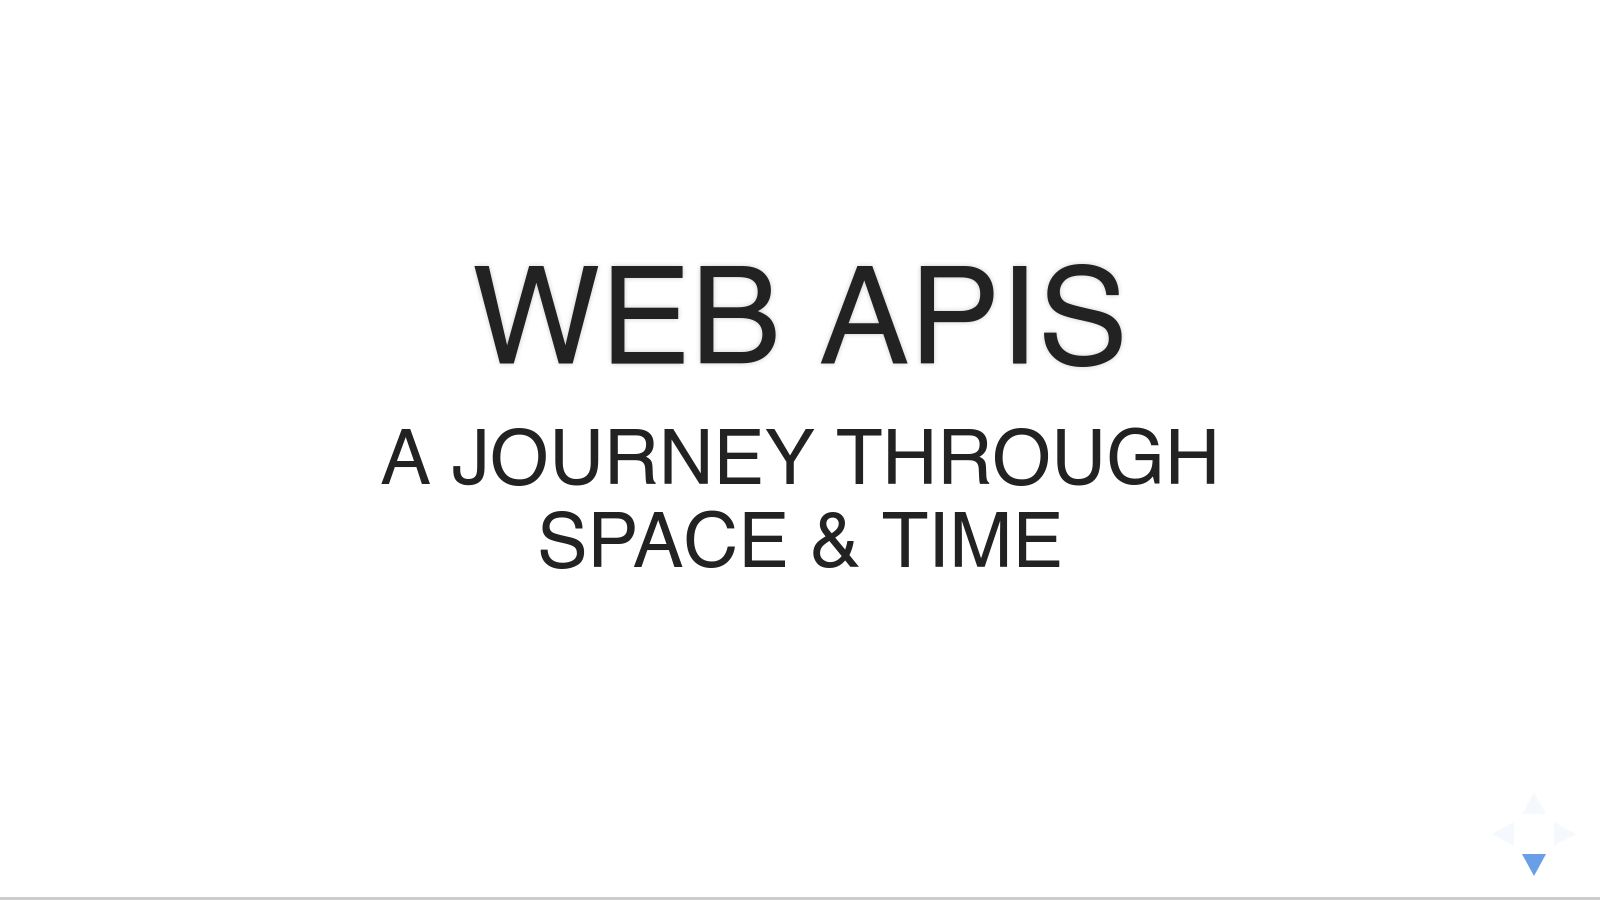 A Journey Through Web API Space & Time